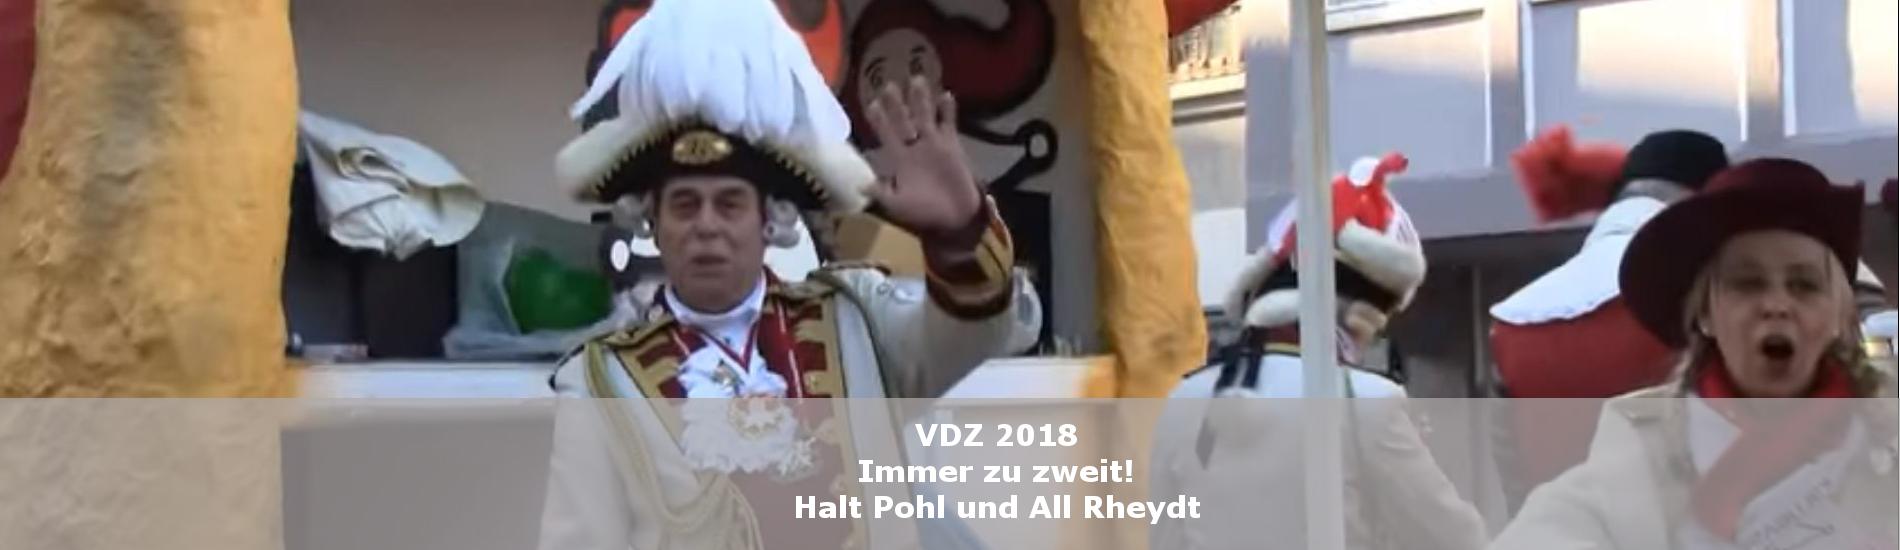 Teaser VDZ 2018